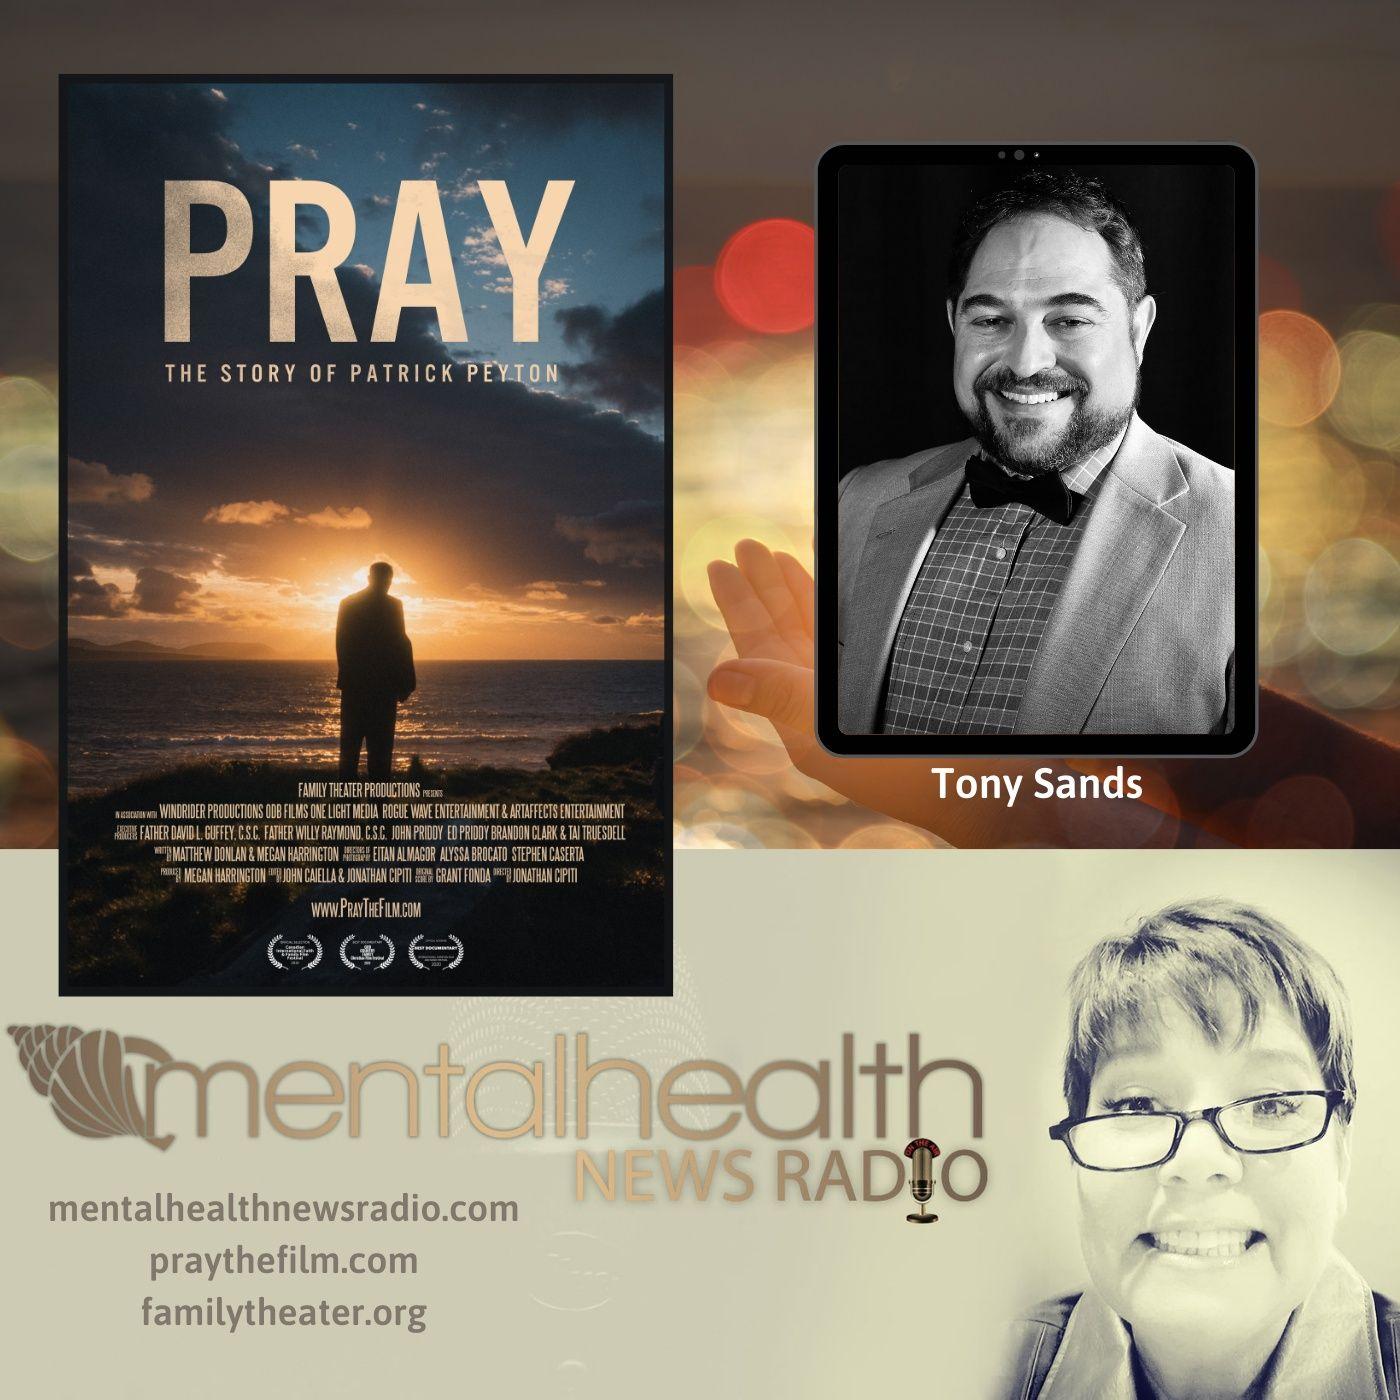 Mental Health News Radio - Pray The Film with Tony Sands